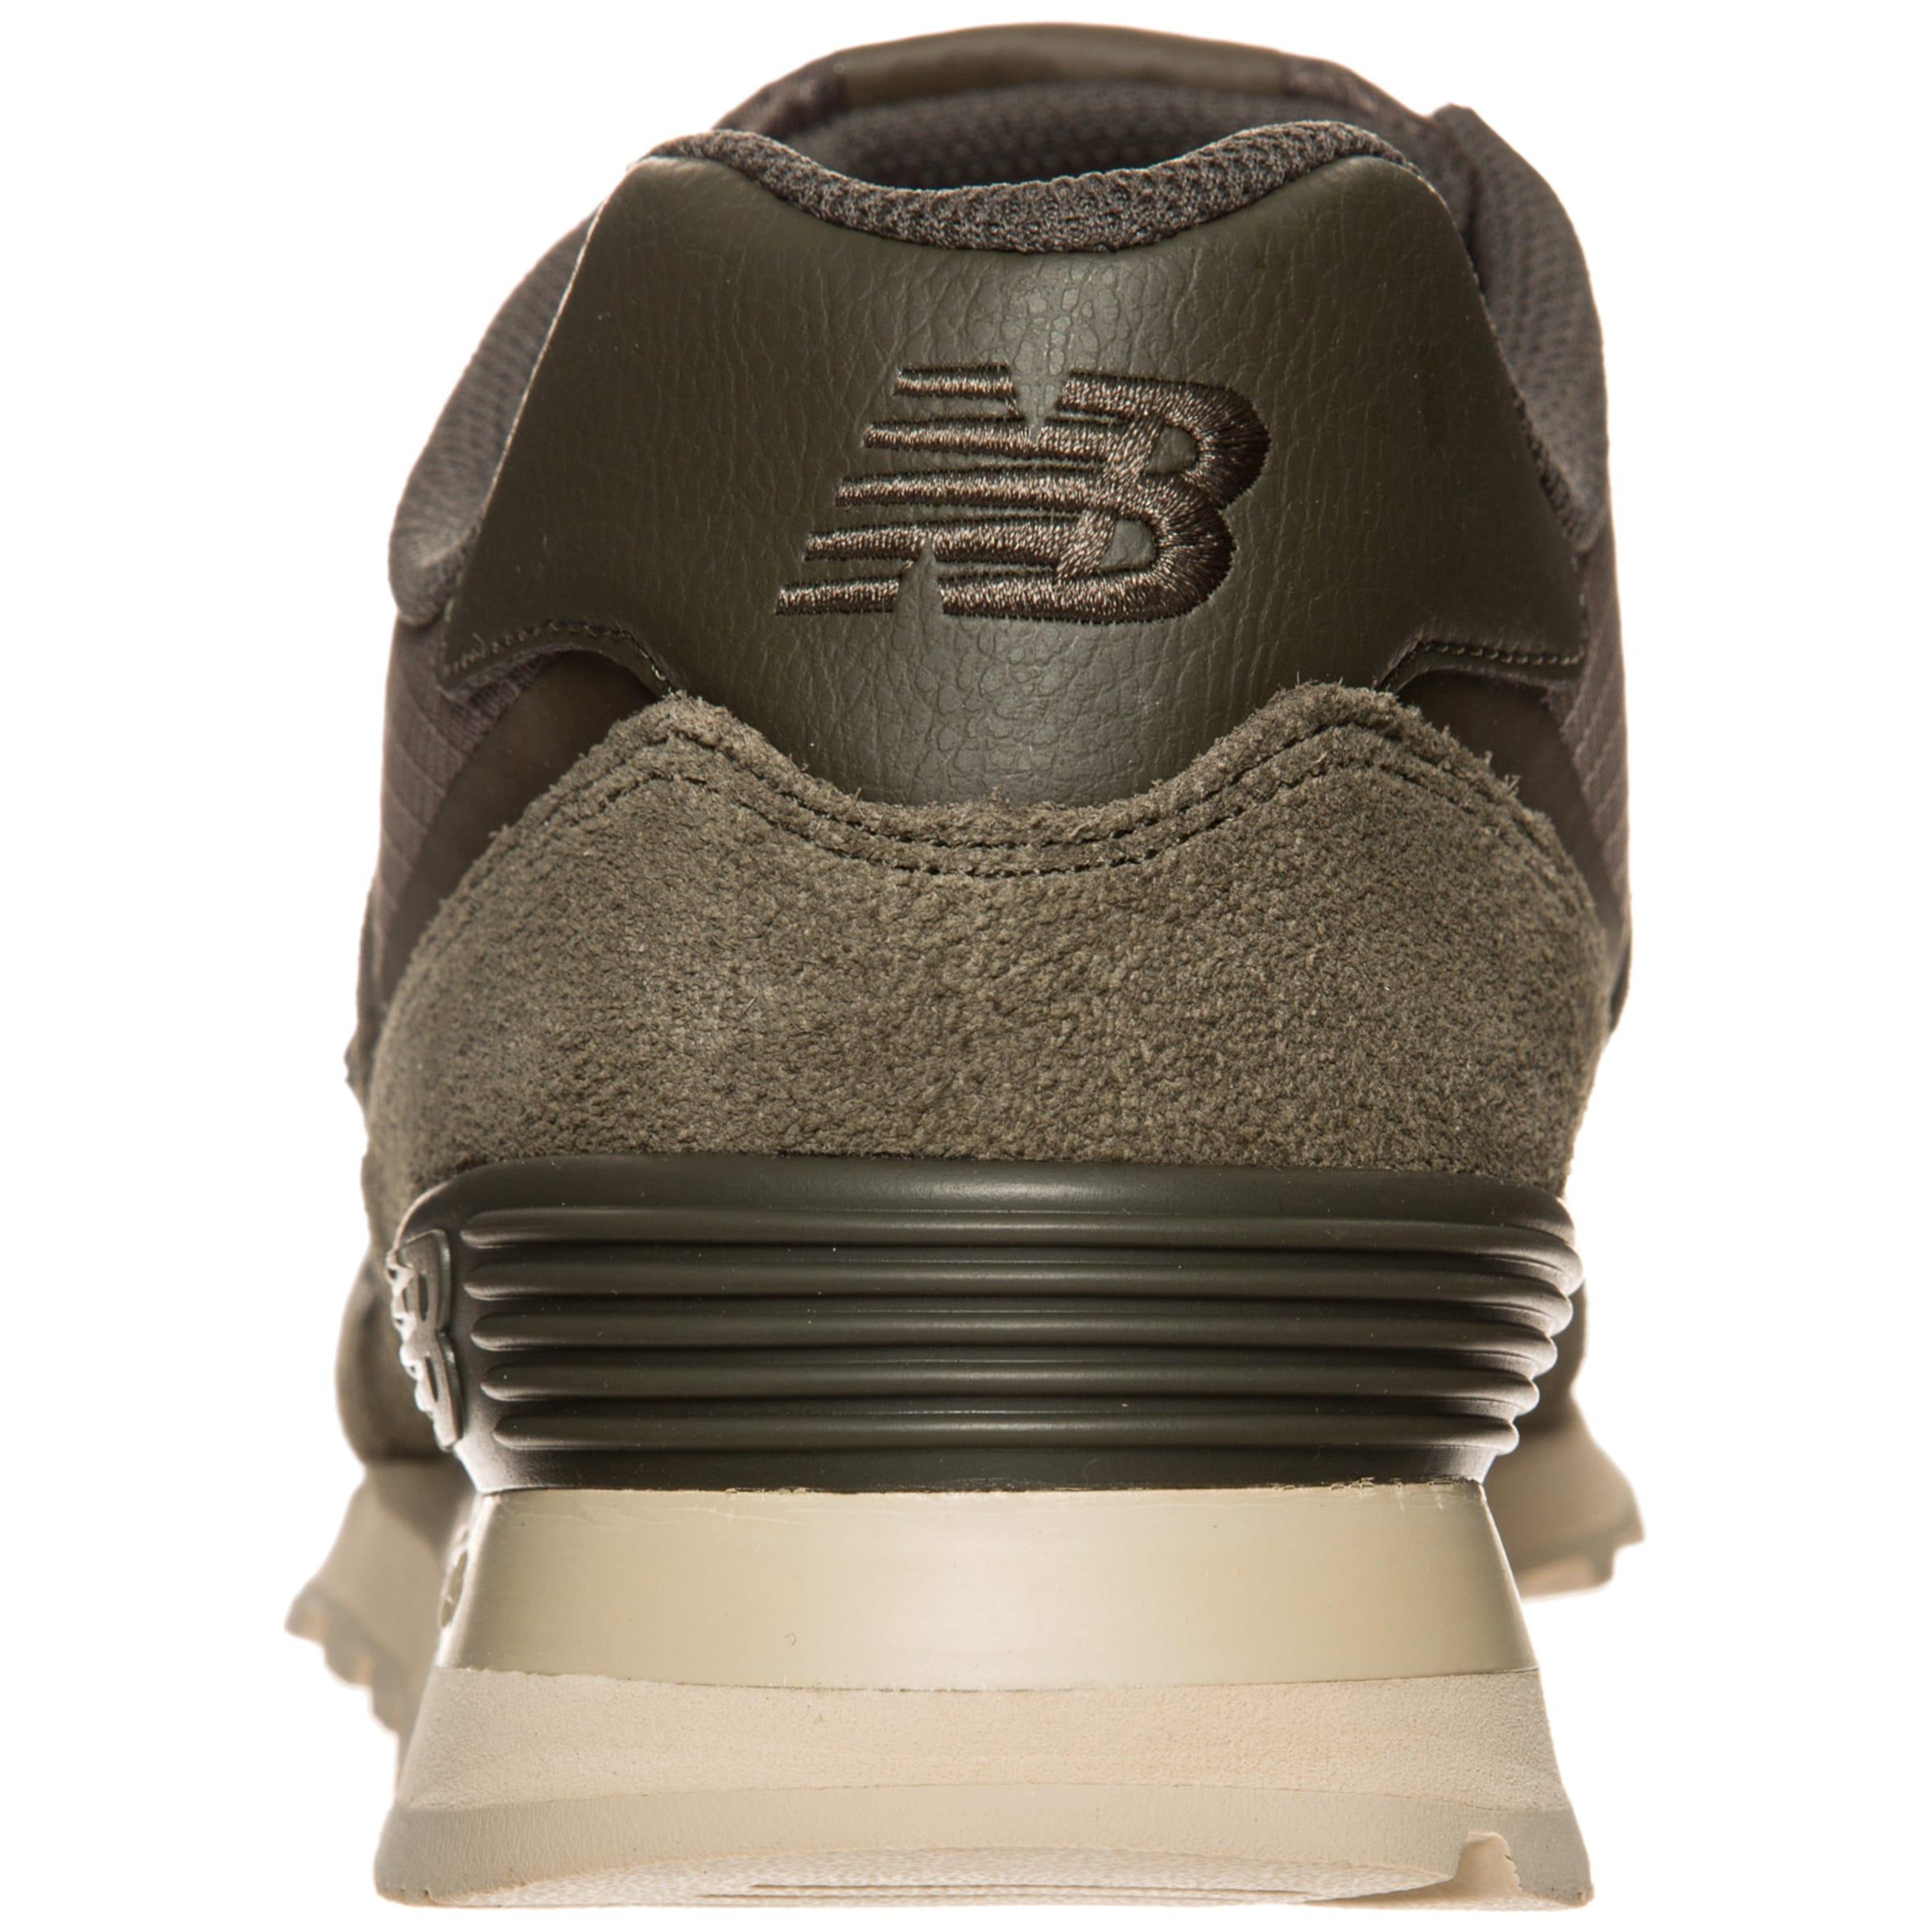 pkt Balance 'ml574 New d' En Baskets Basses Kaki 7g6yvYbf